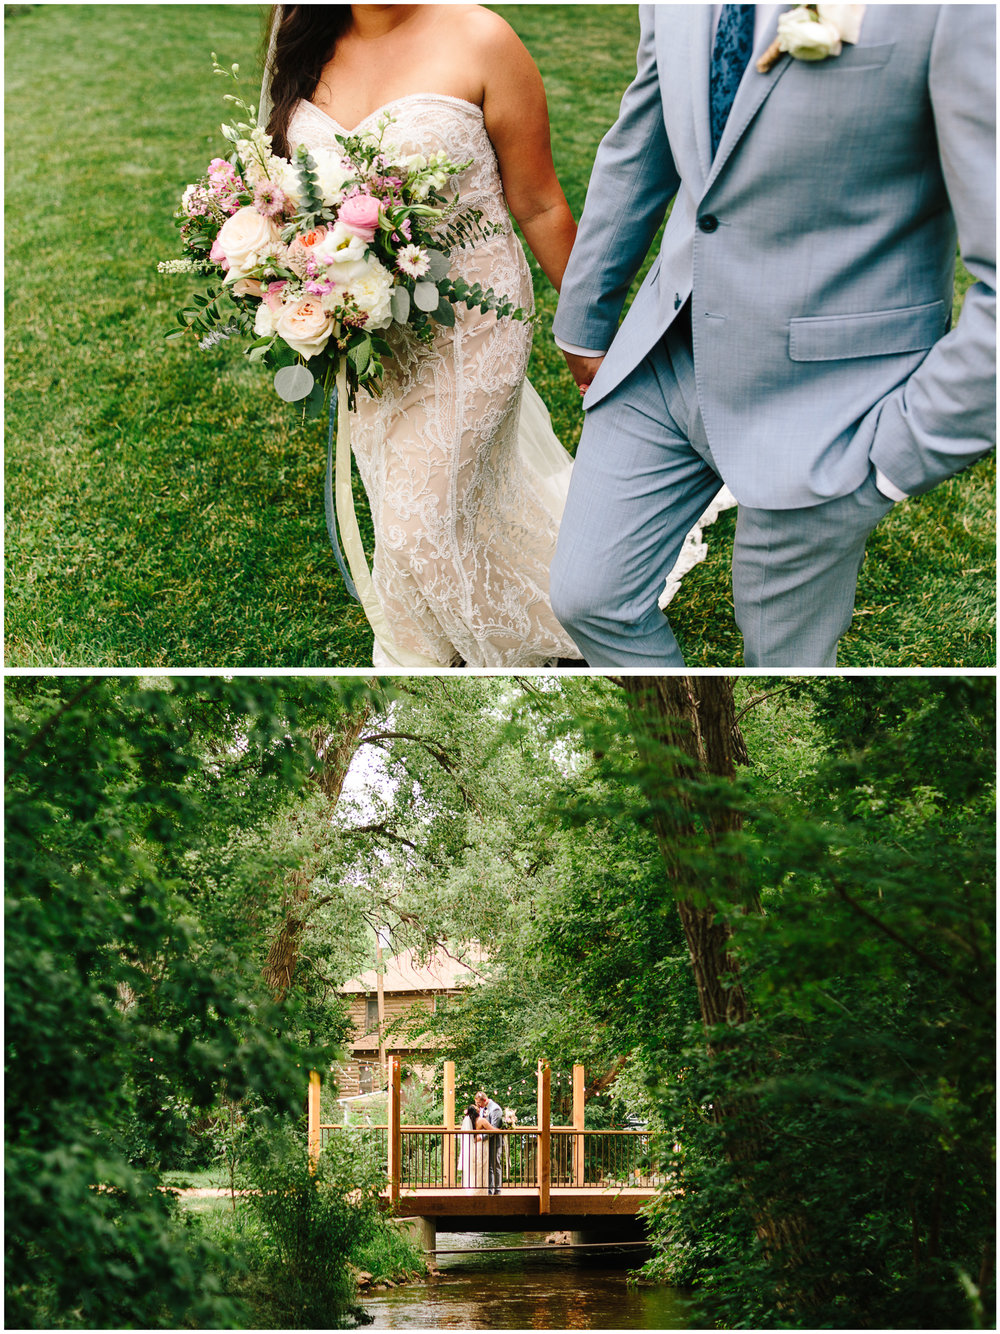 lyons_farmette_wedding_42.jpg